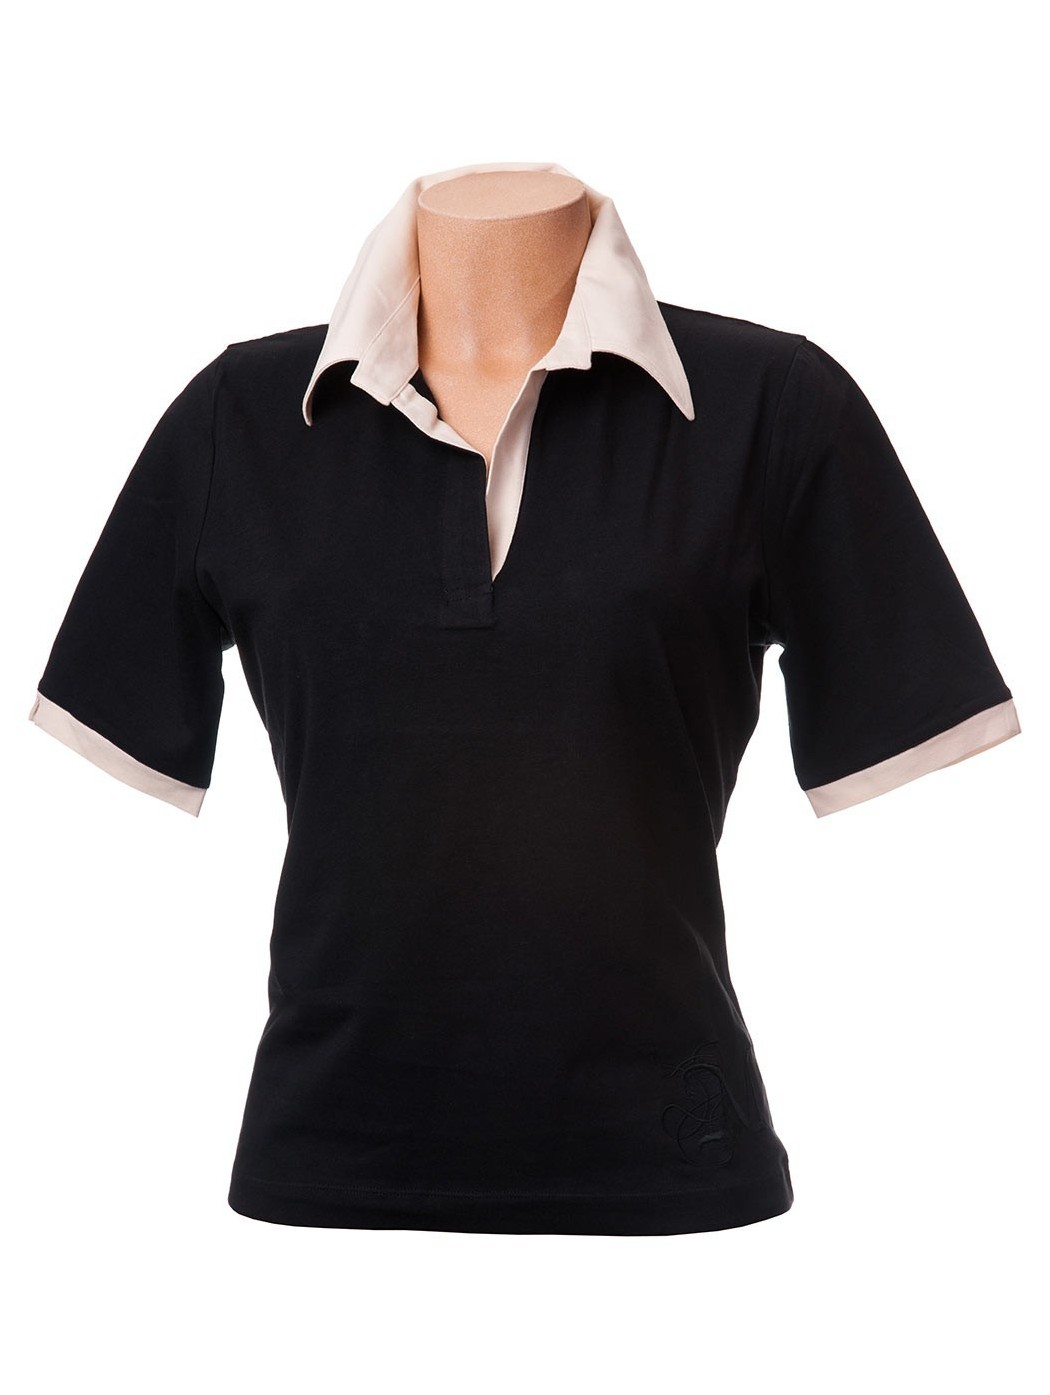 Two-coloured polo shirt